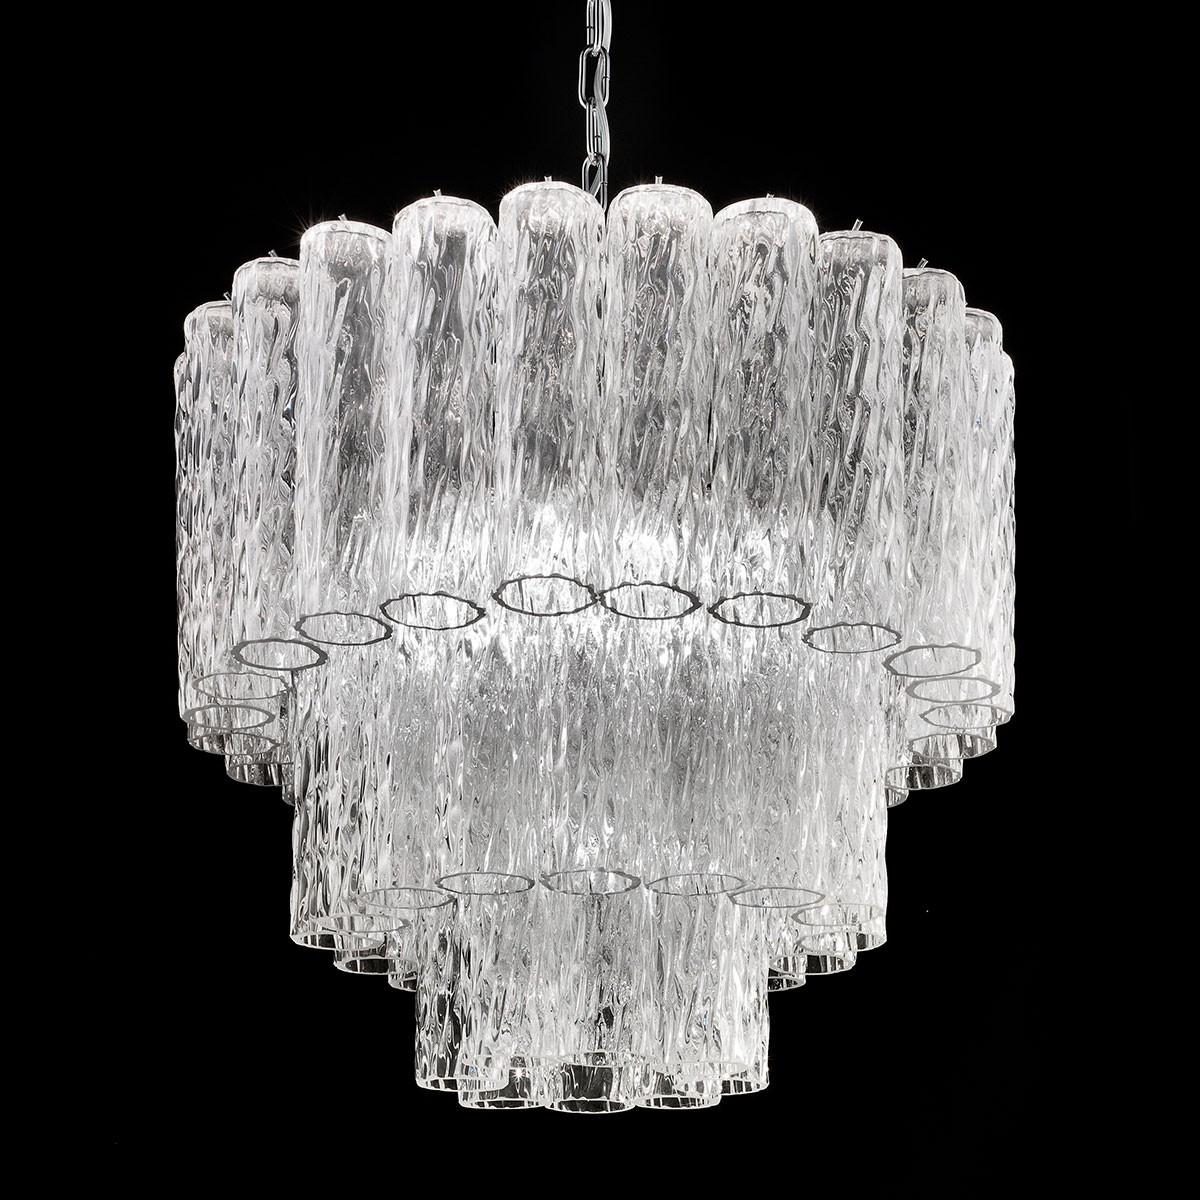 """Tronchi"" lampara de araña de Murano - 7 luces - trasparente y cromo"